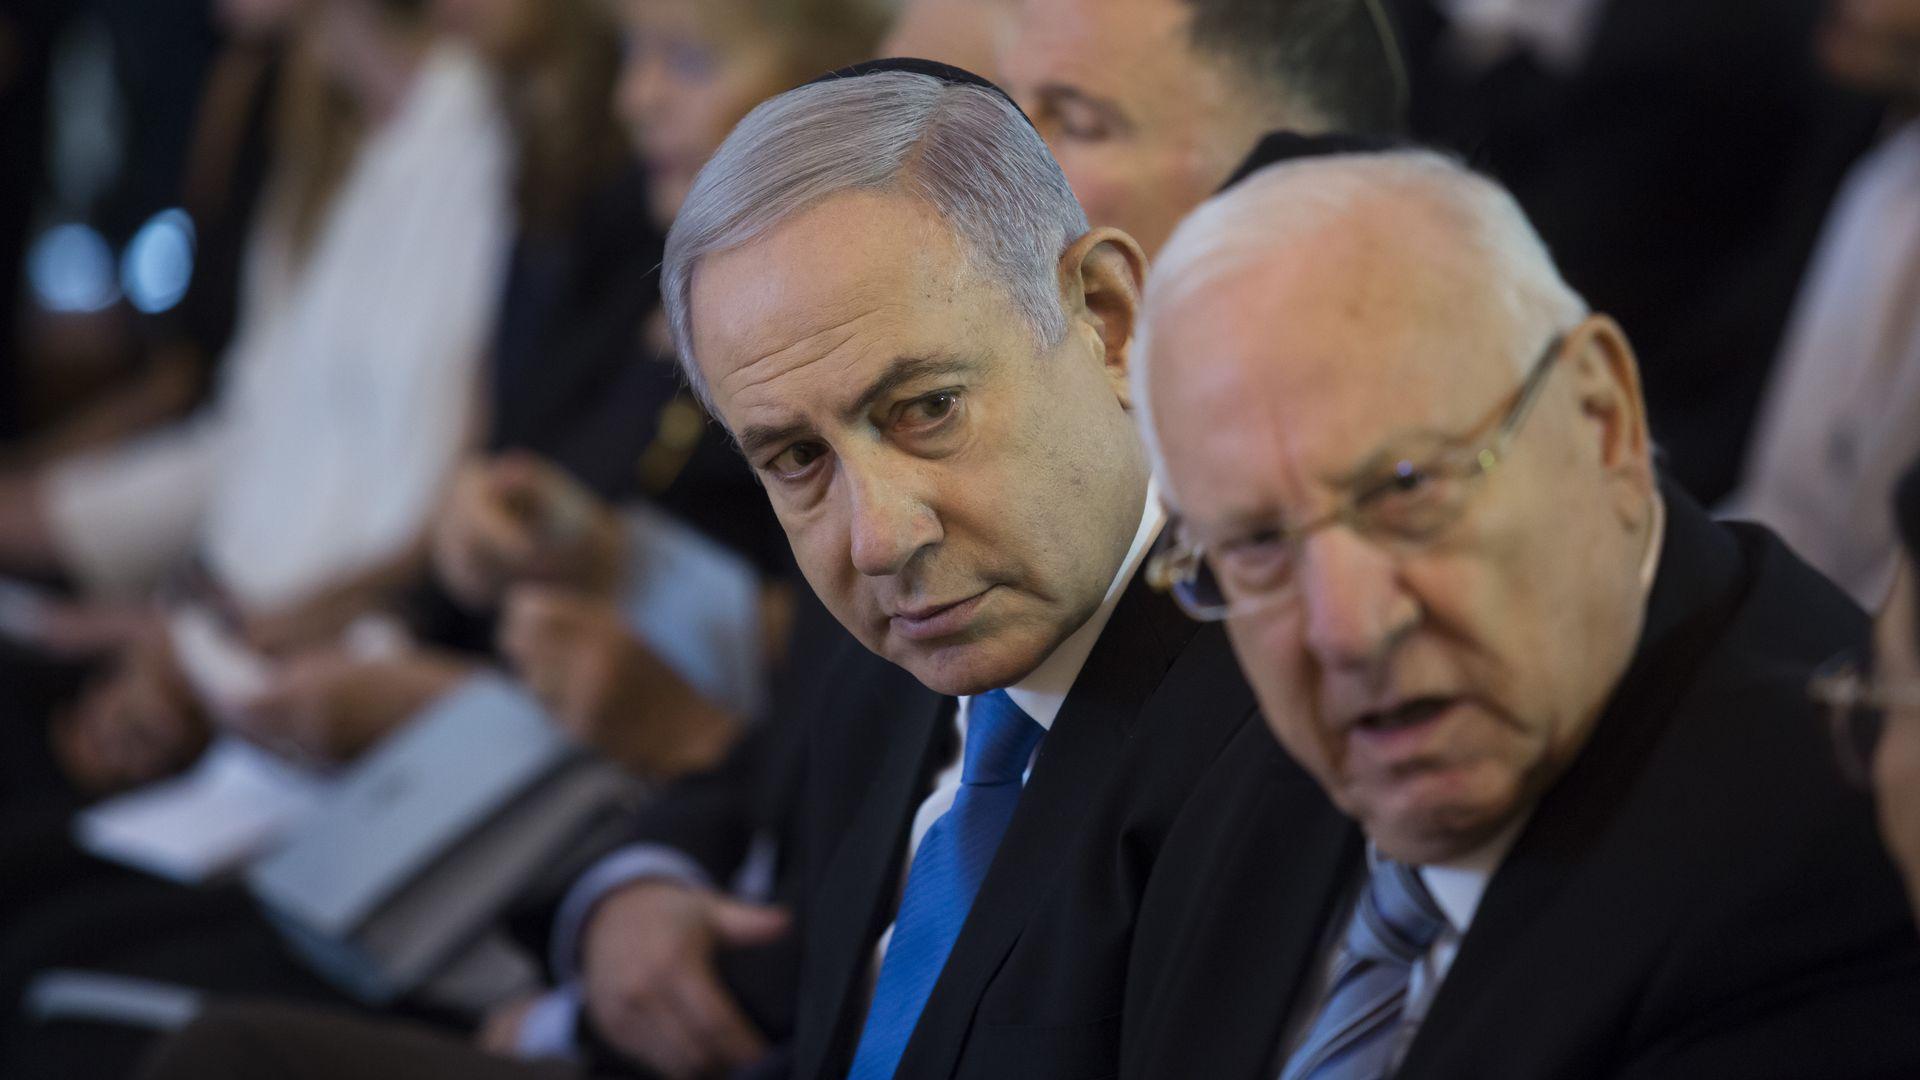 Trump to meet with Israeli leaders following Mideast peace plan release next week